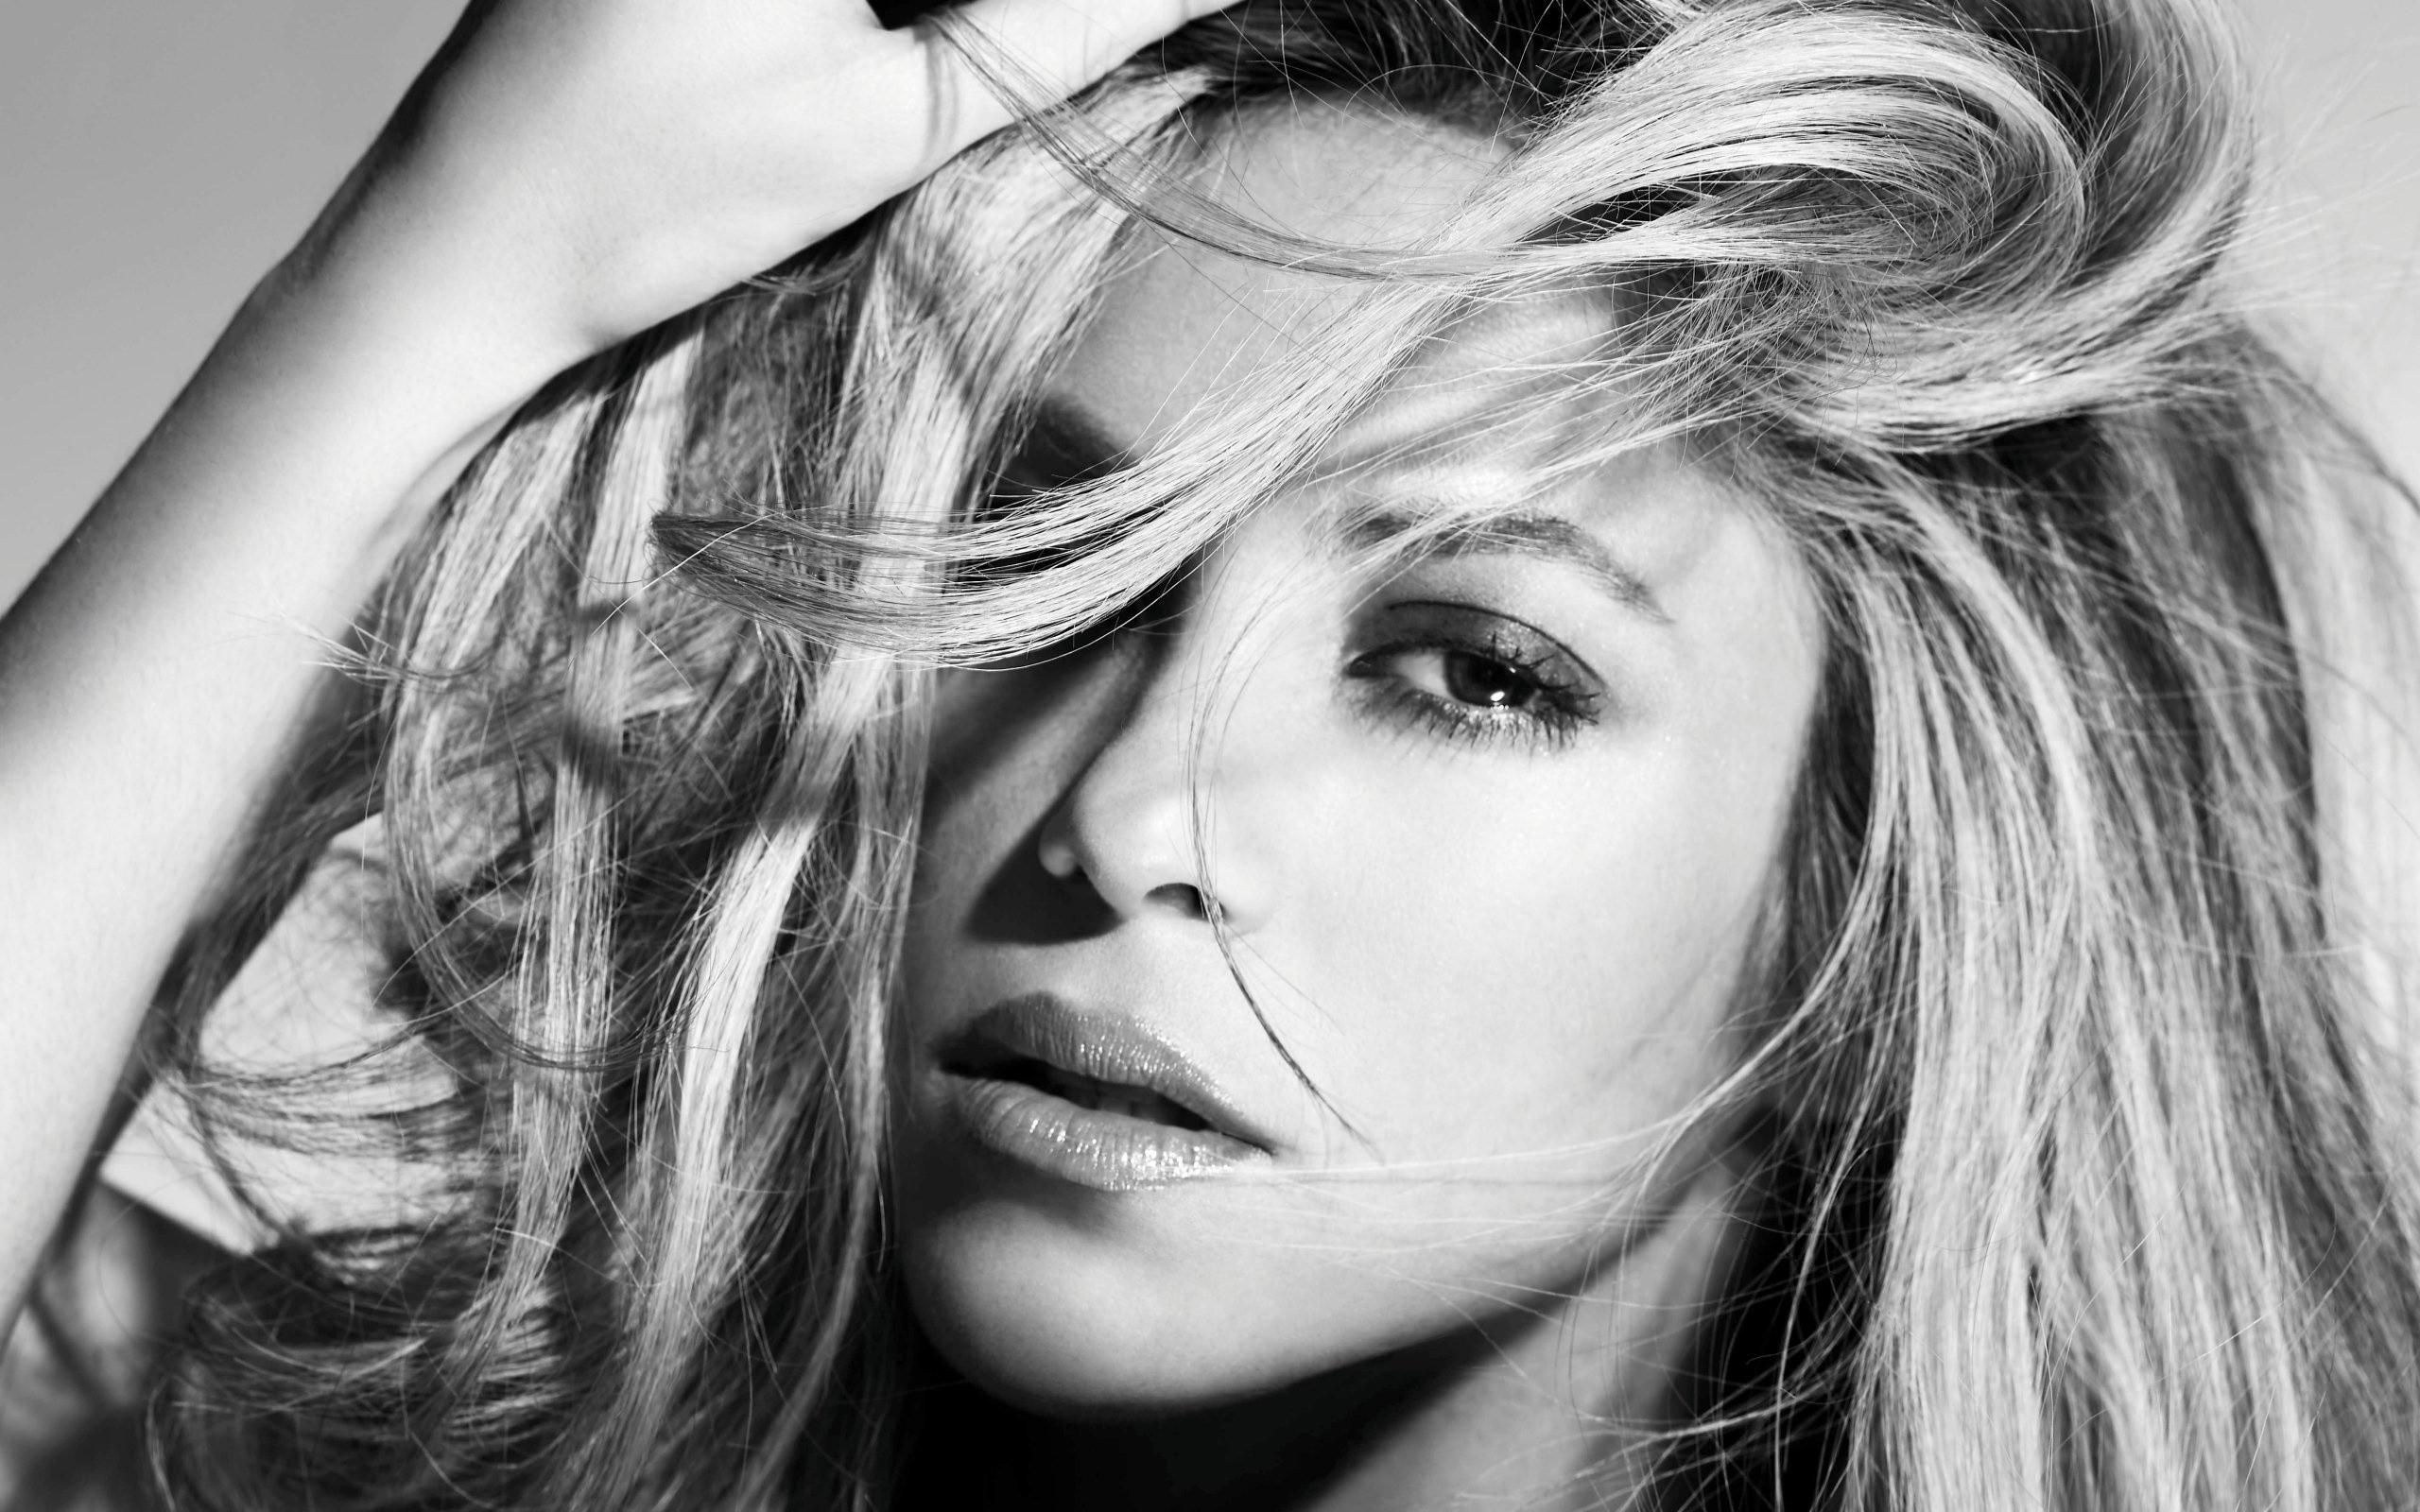 Shakira Wallpaper Black And White Hd Desktop Wallpapers 4k Hd